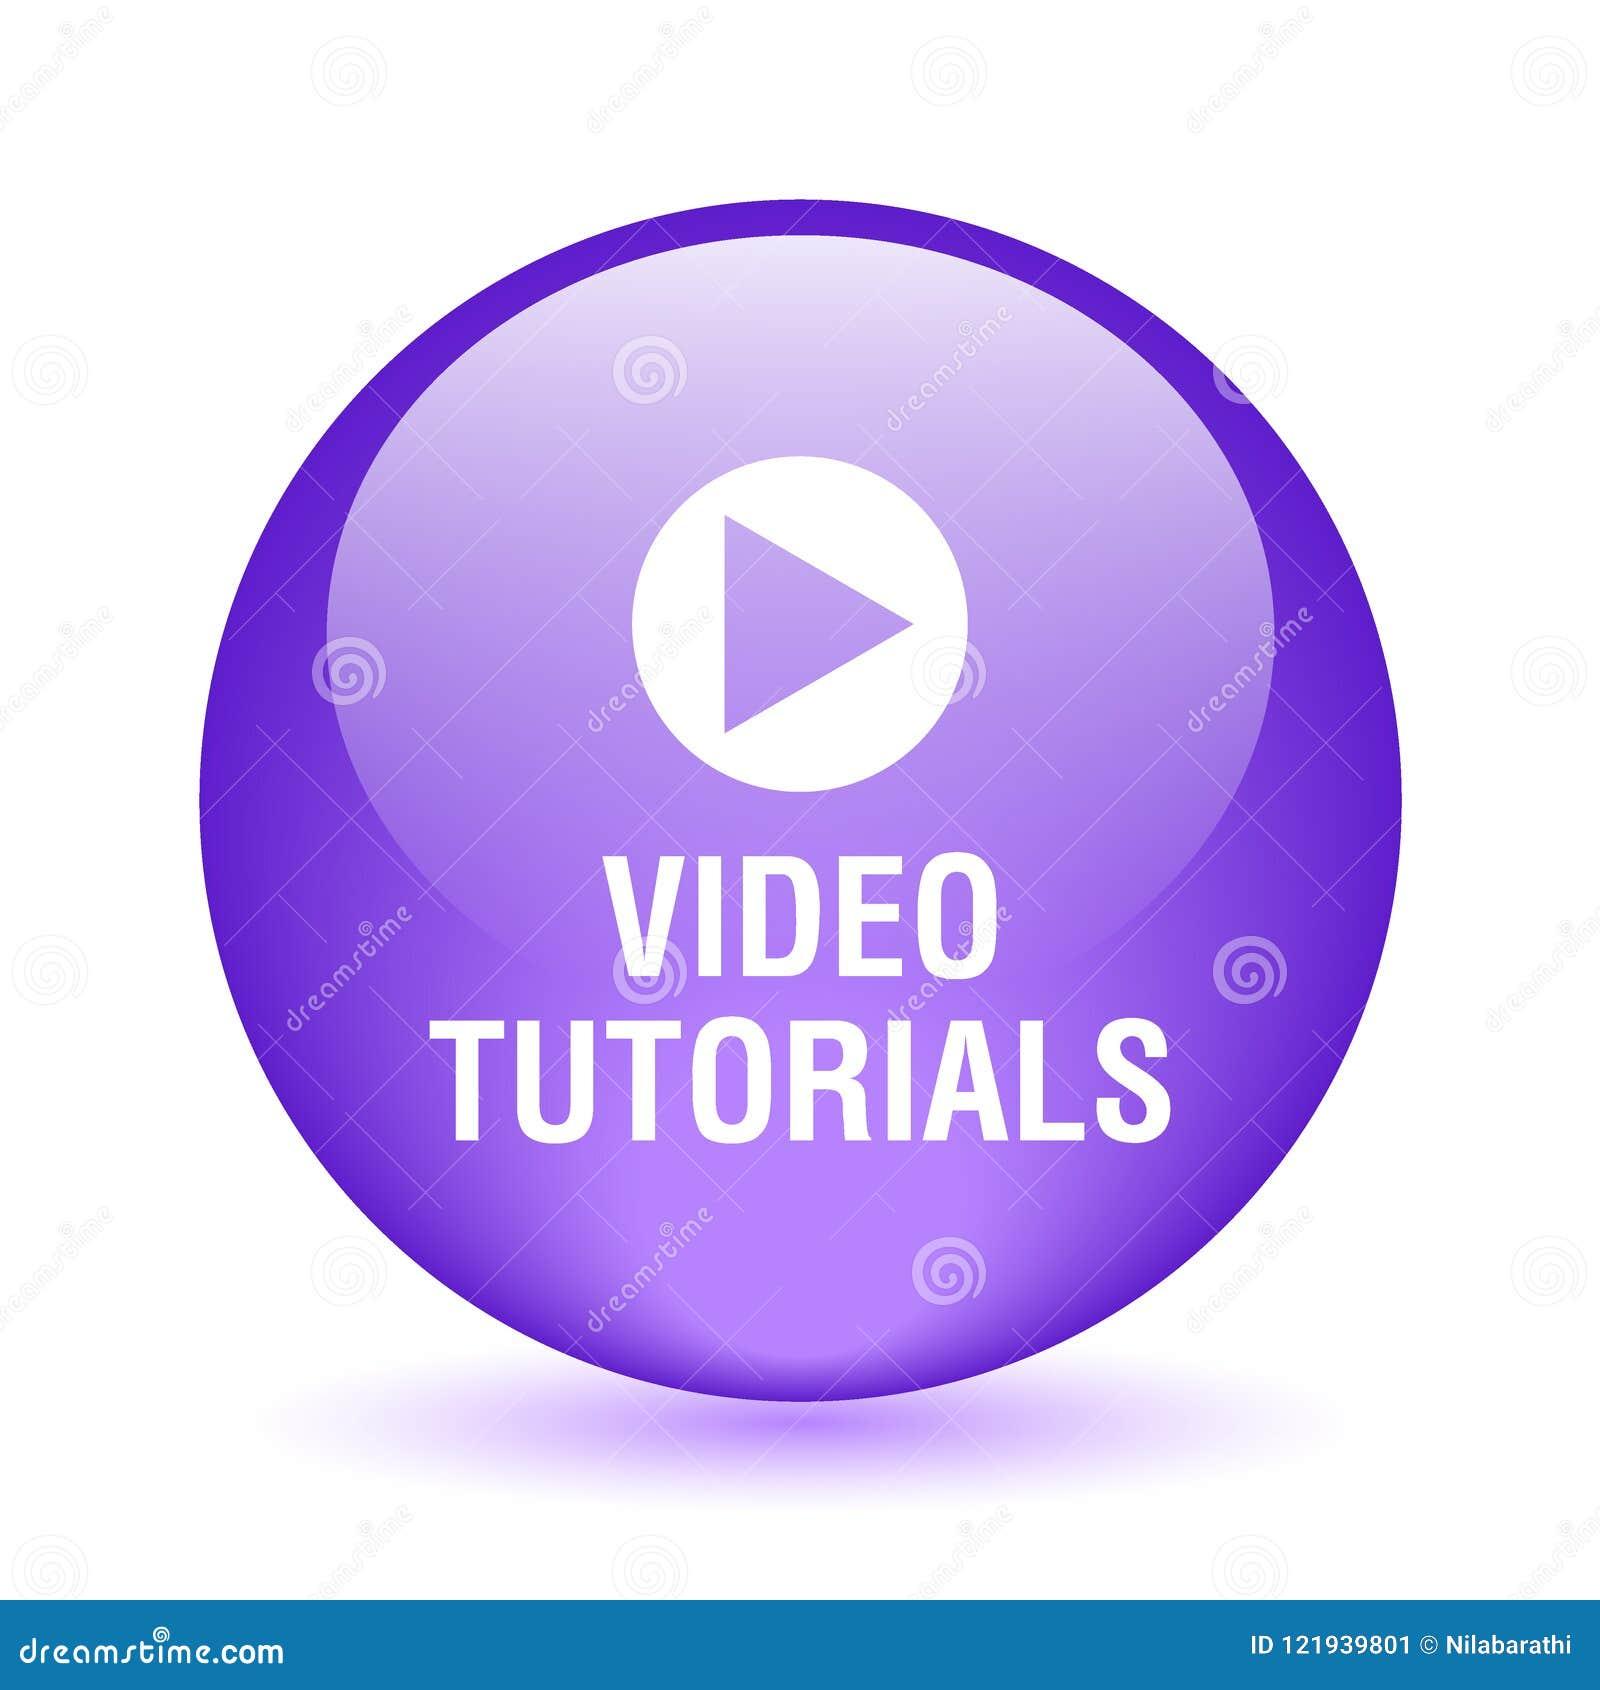 Video tutorial button